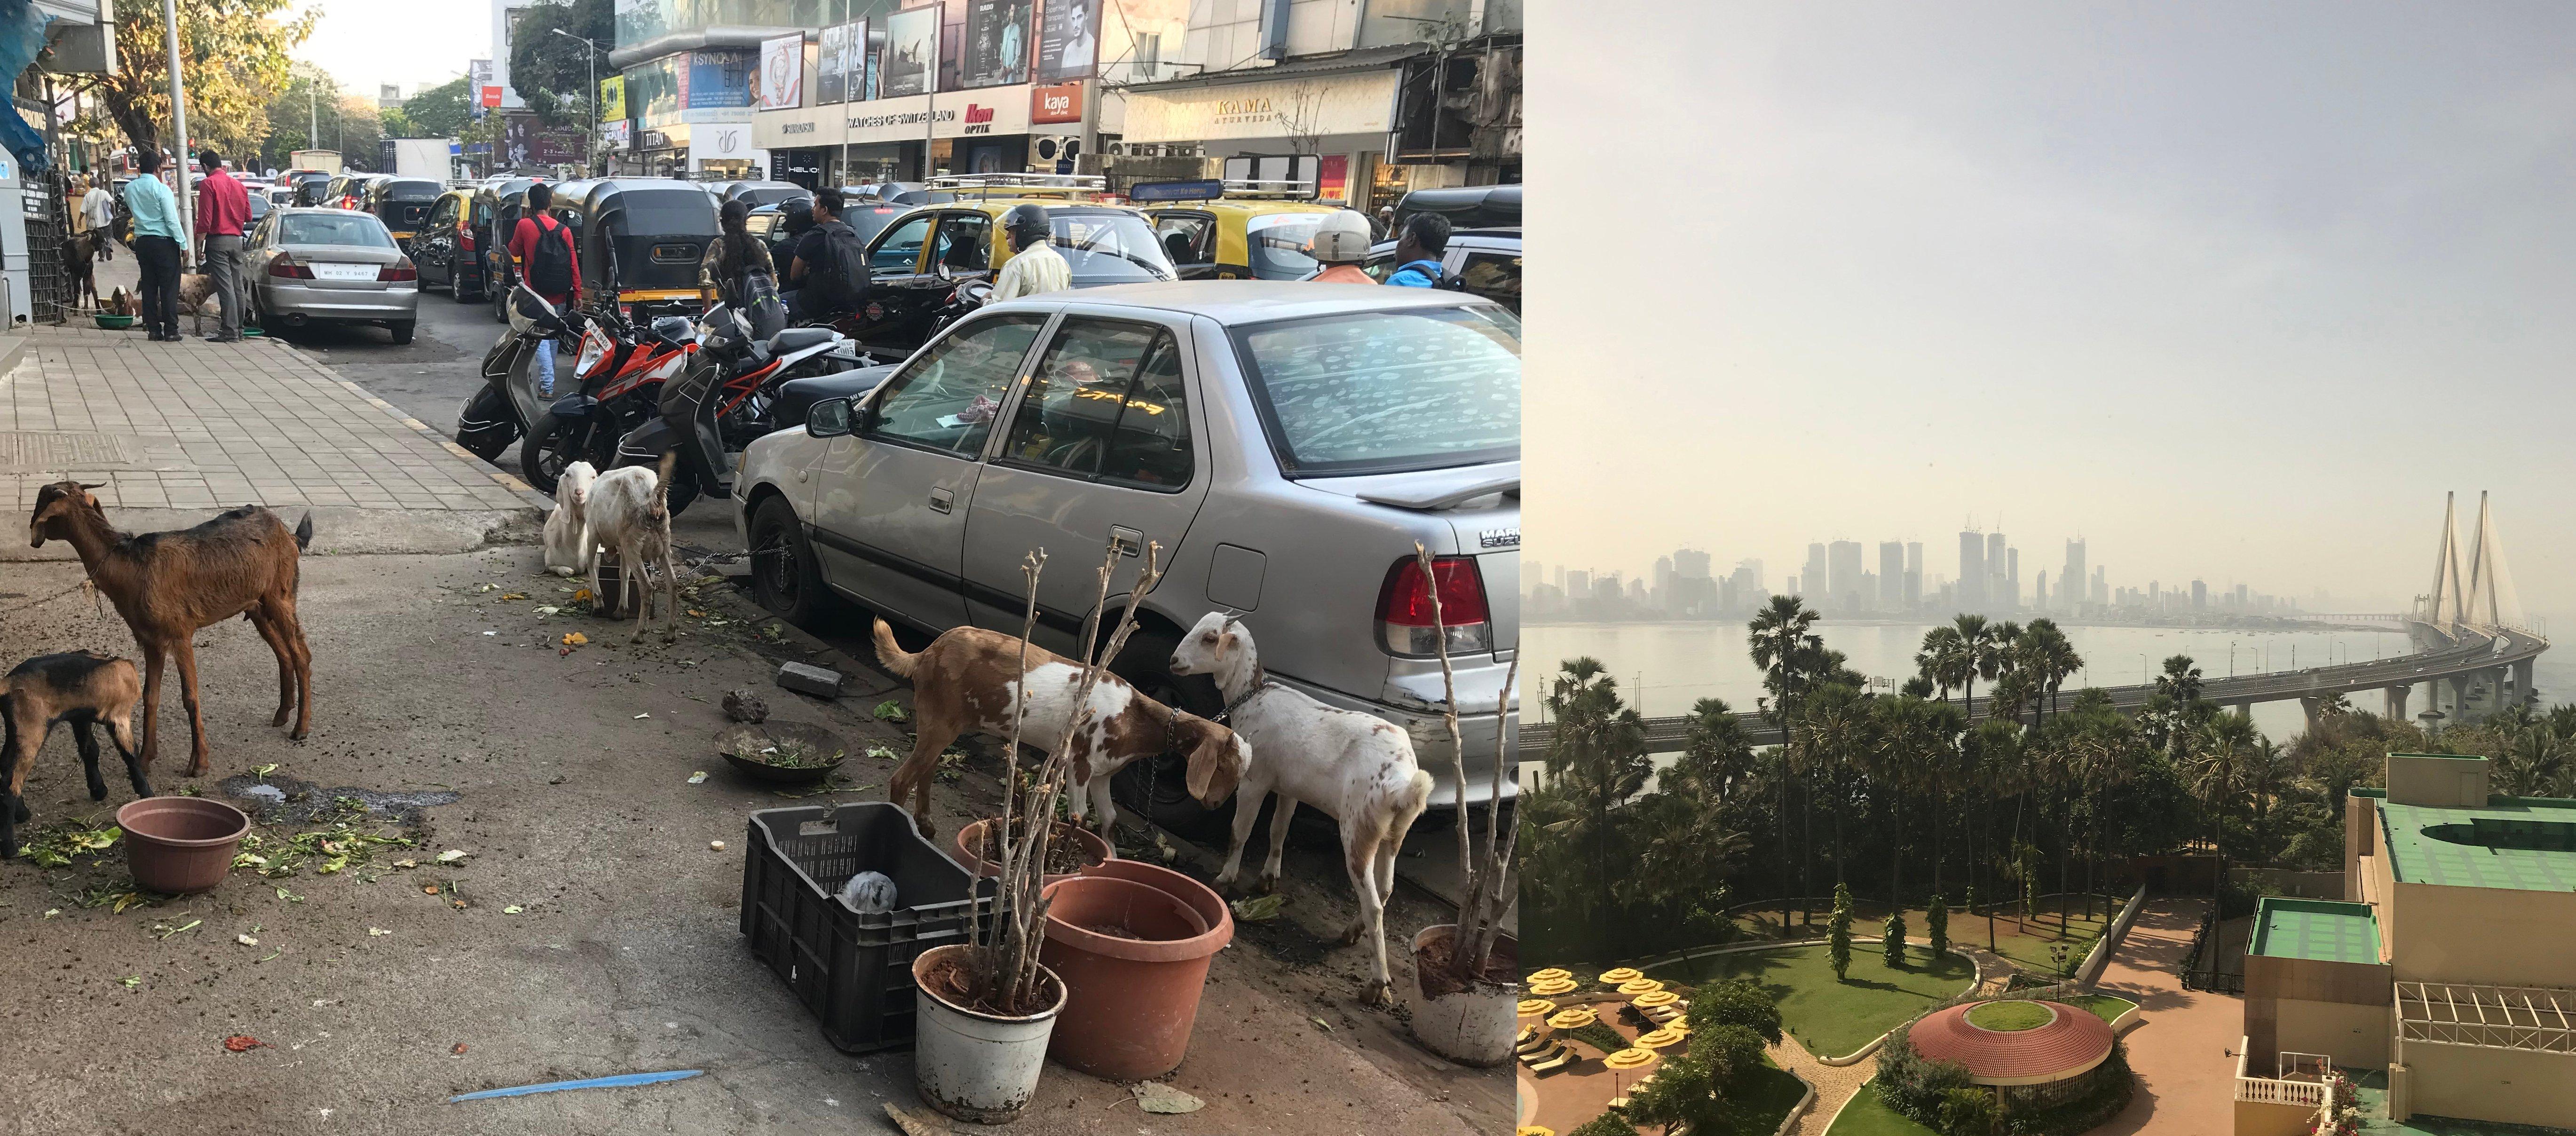 Indias contrasts - horizontal